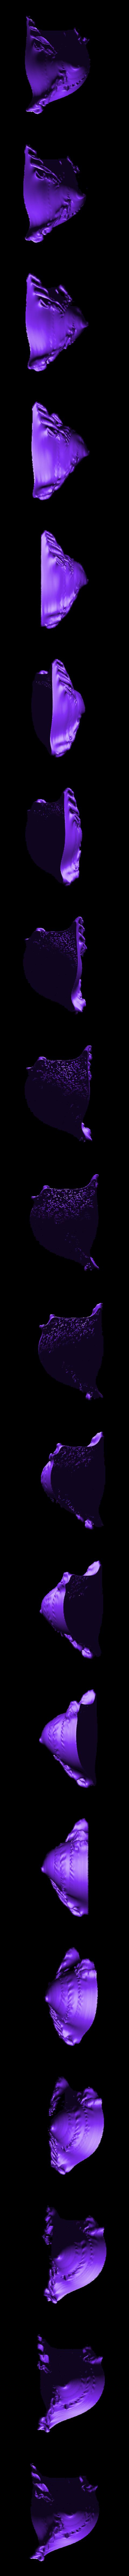 pie1.stl Download free STL file Weird terrain collection • 3D printer object, ferjerez3d